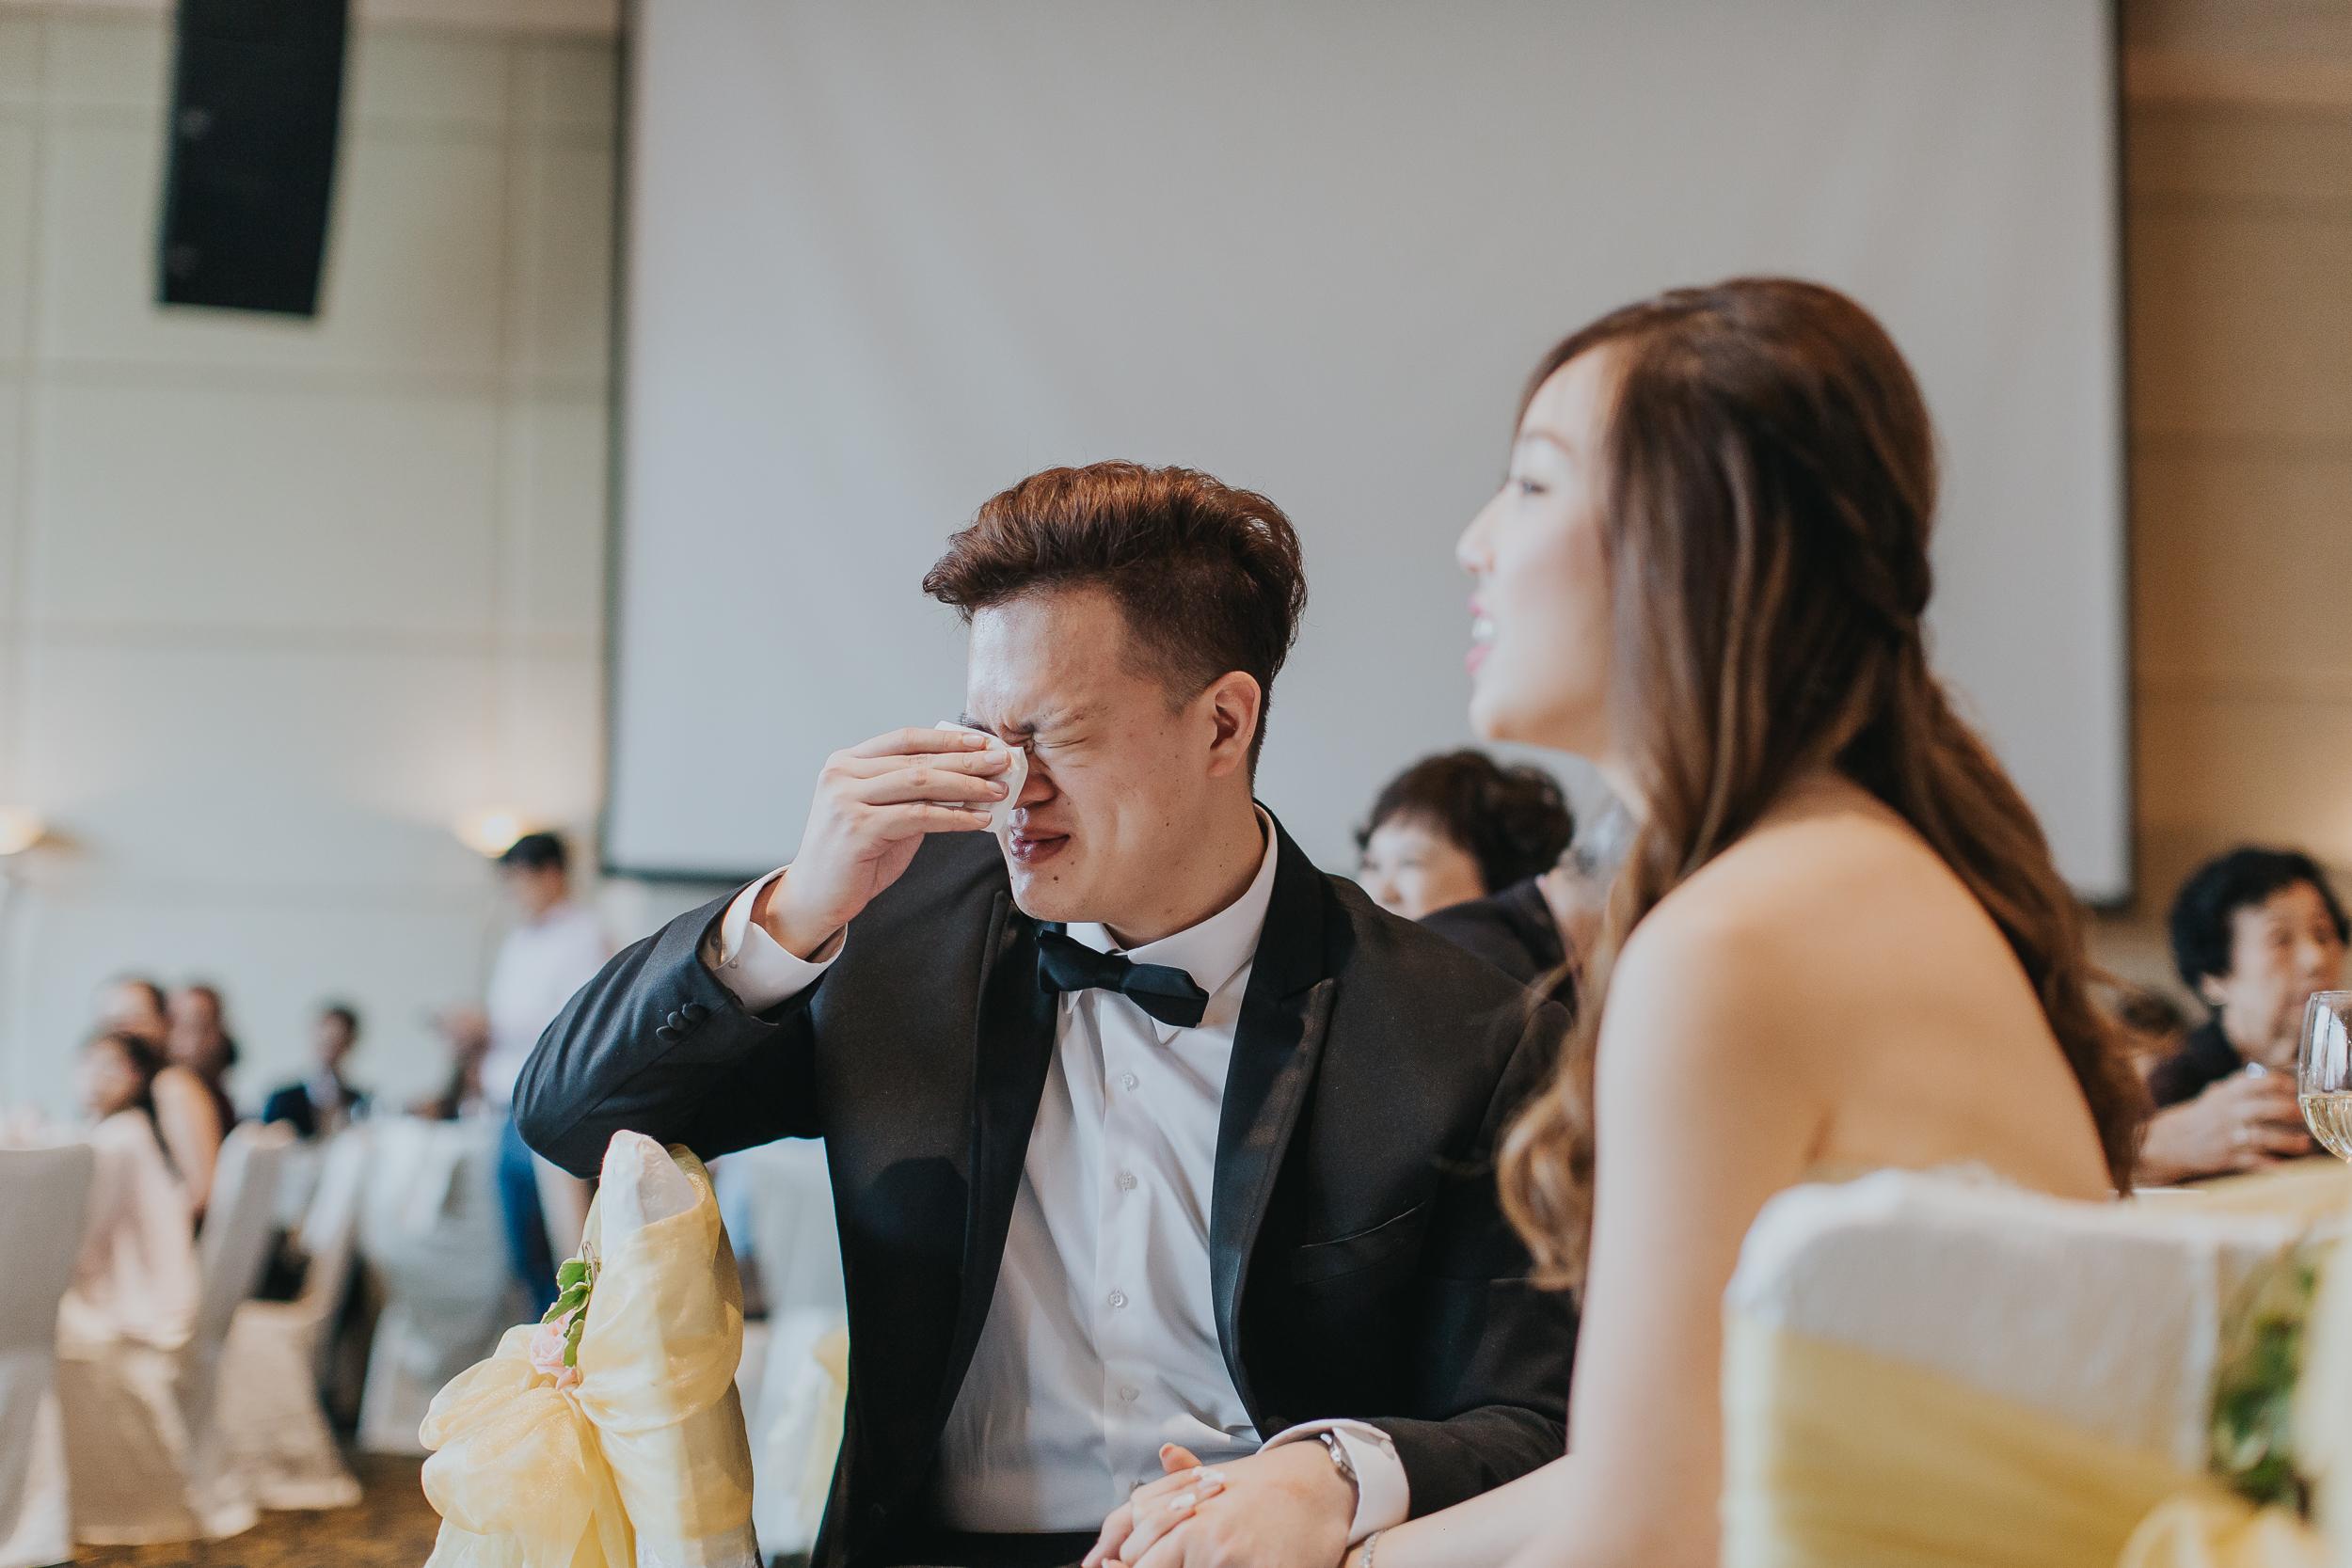 Singapore+Actual+Day+Wedding+Photographer+Grand+Mercure+Oliver+Estelle-0091.jpg